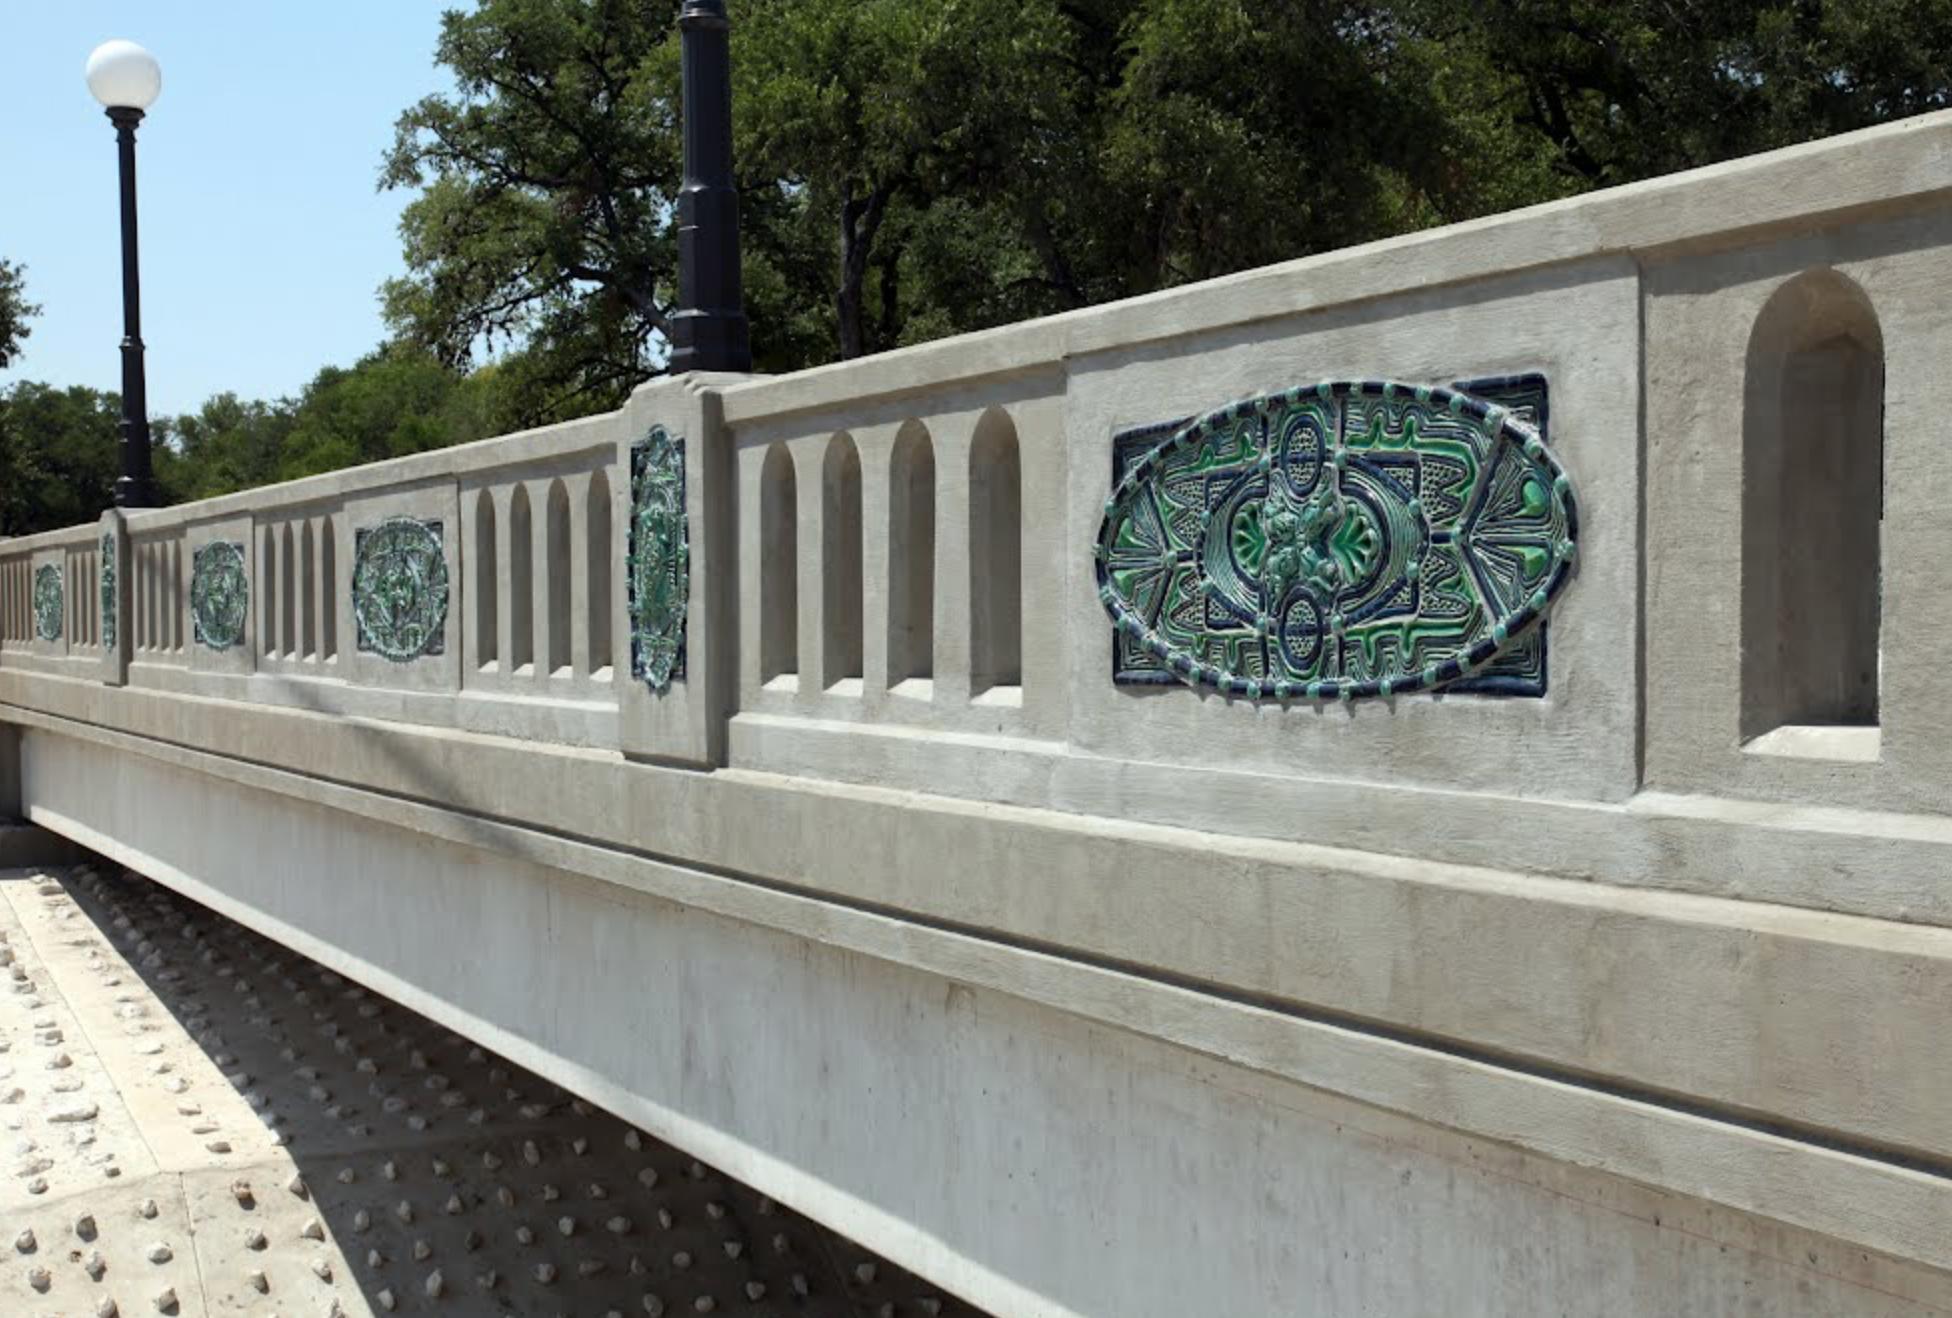 exterior ceramic tile public art by Diana Kersey in San Antonio